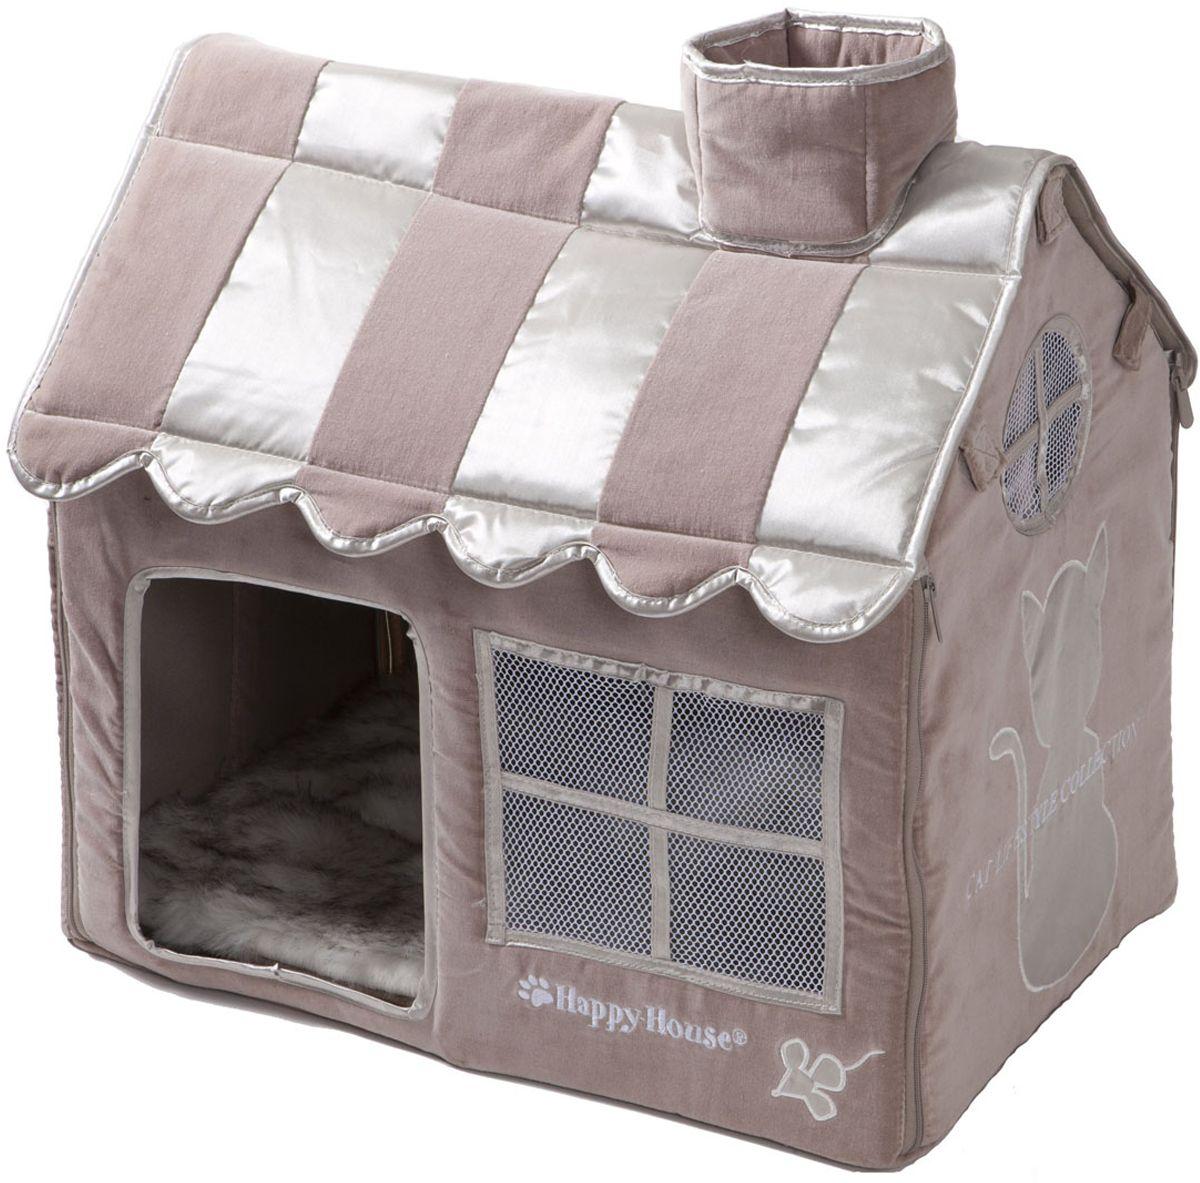 Домик для кошек Happy House Cat Lifestyle, цвет: серый, молочно-коричневый, 52 х 36 х 49 см подушка для животных happy house canvas цвет черный 107 х 70 х 10 см